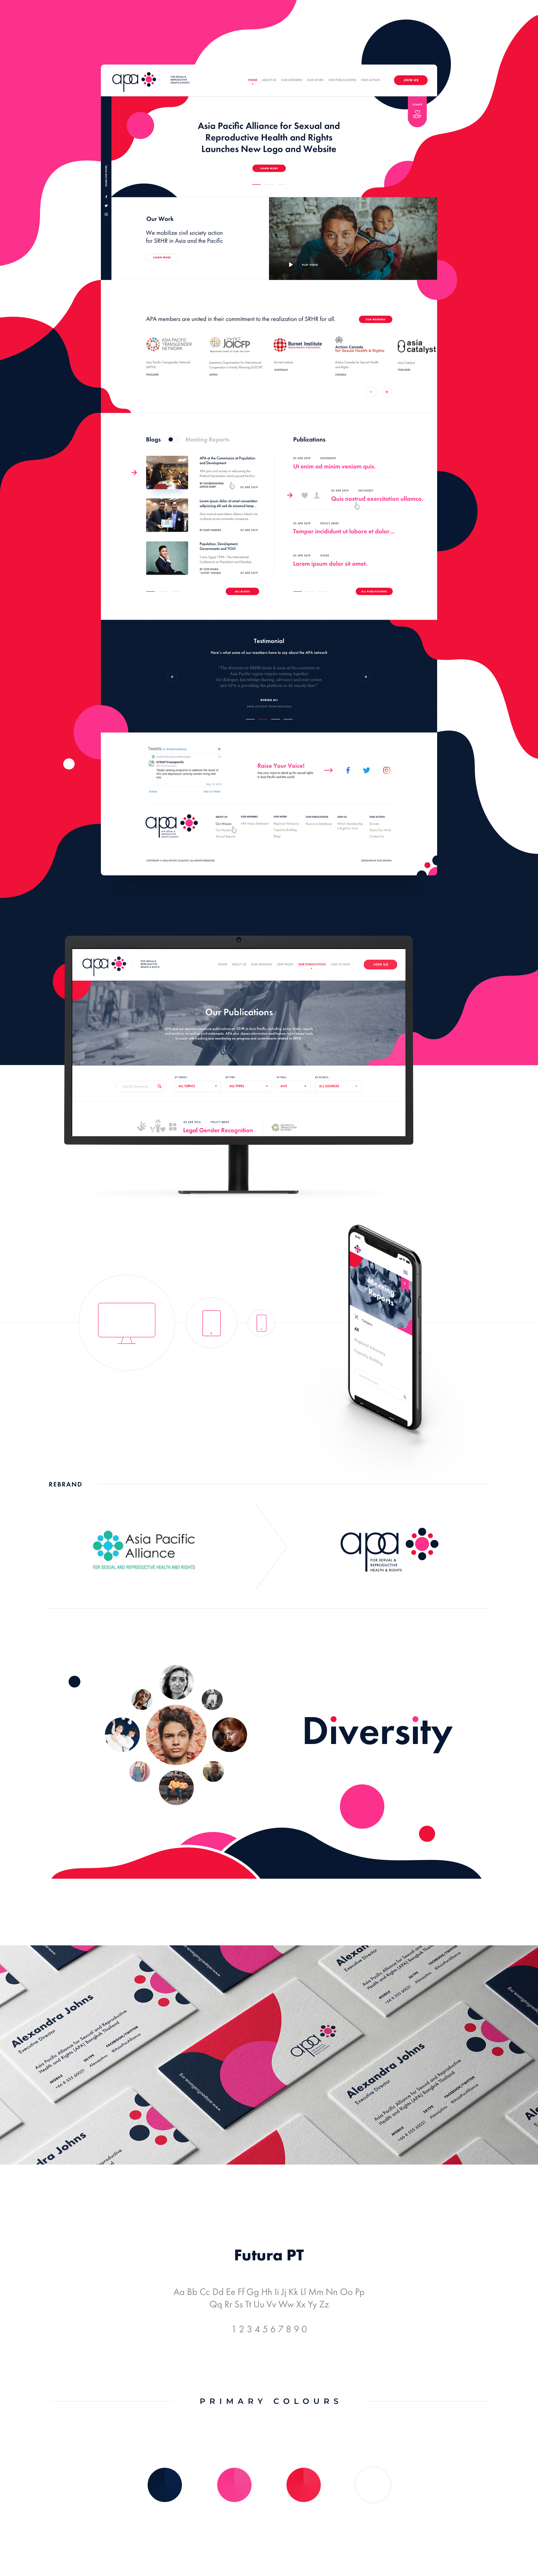 KOS Design - Asia Pacific Alliance